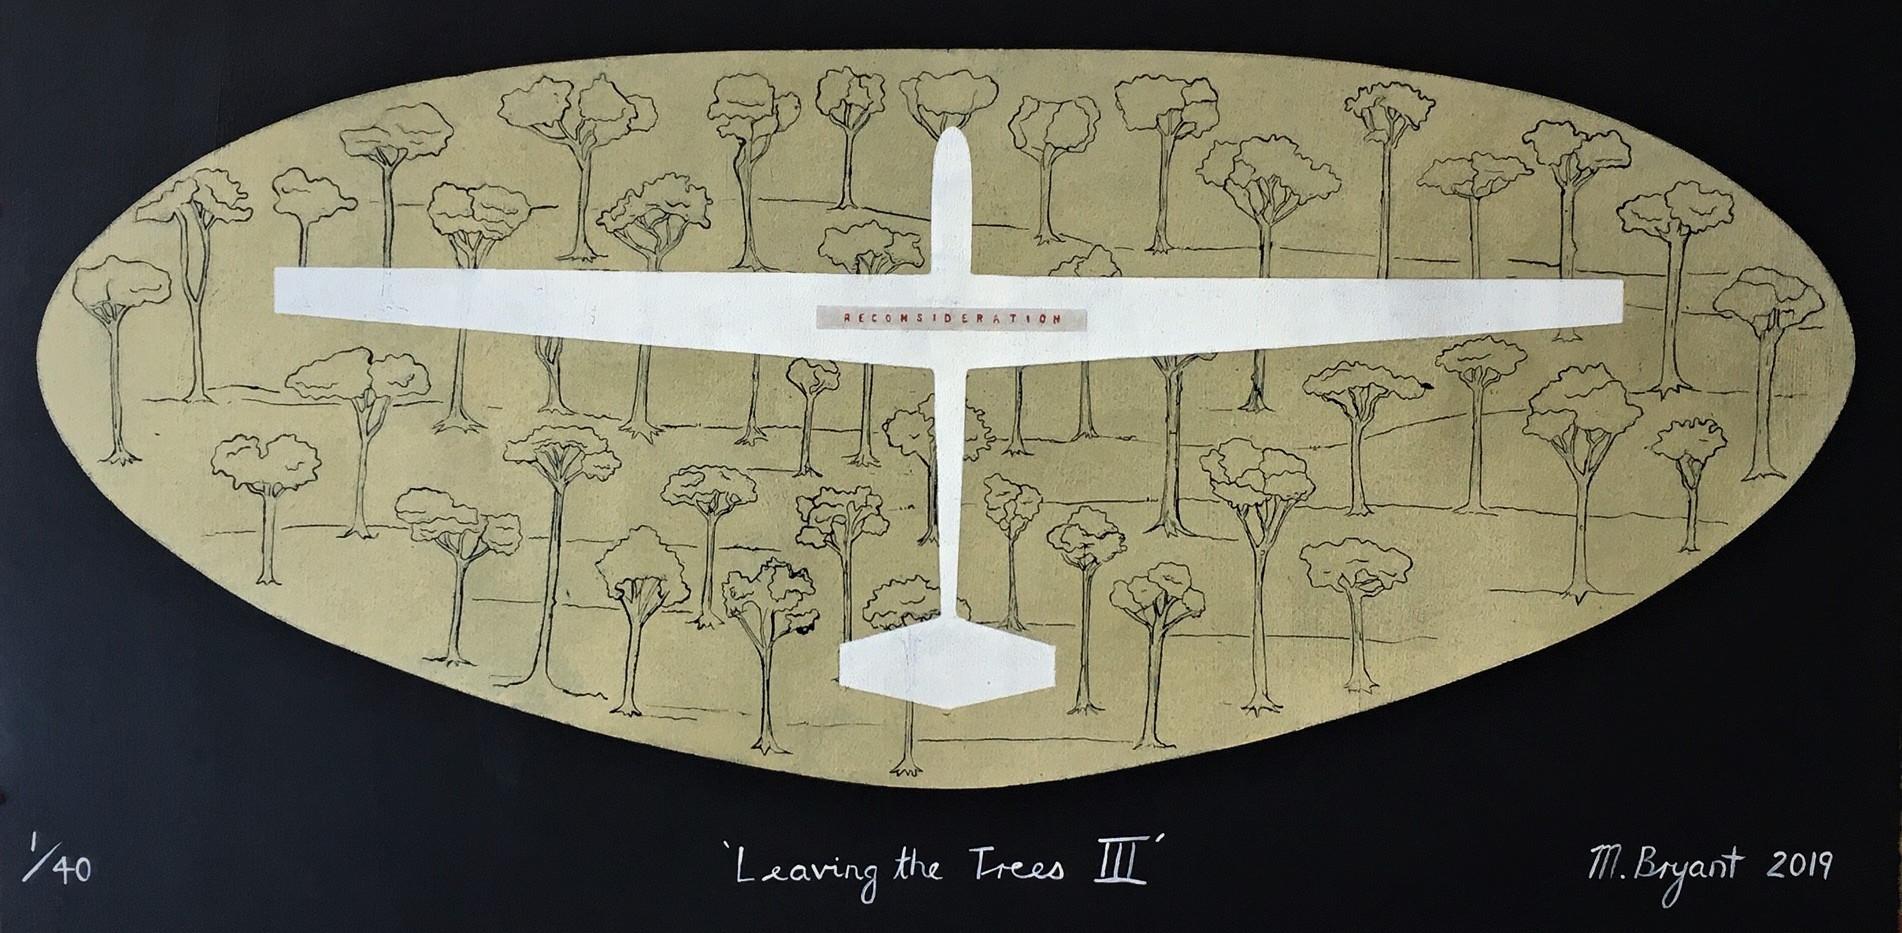 Leaving the Trees III